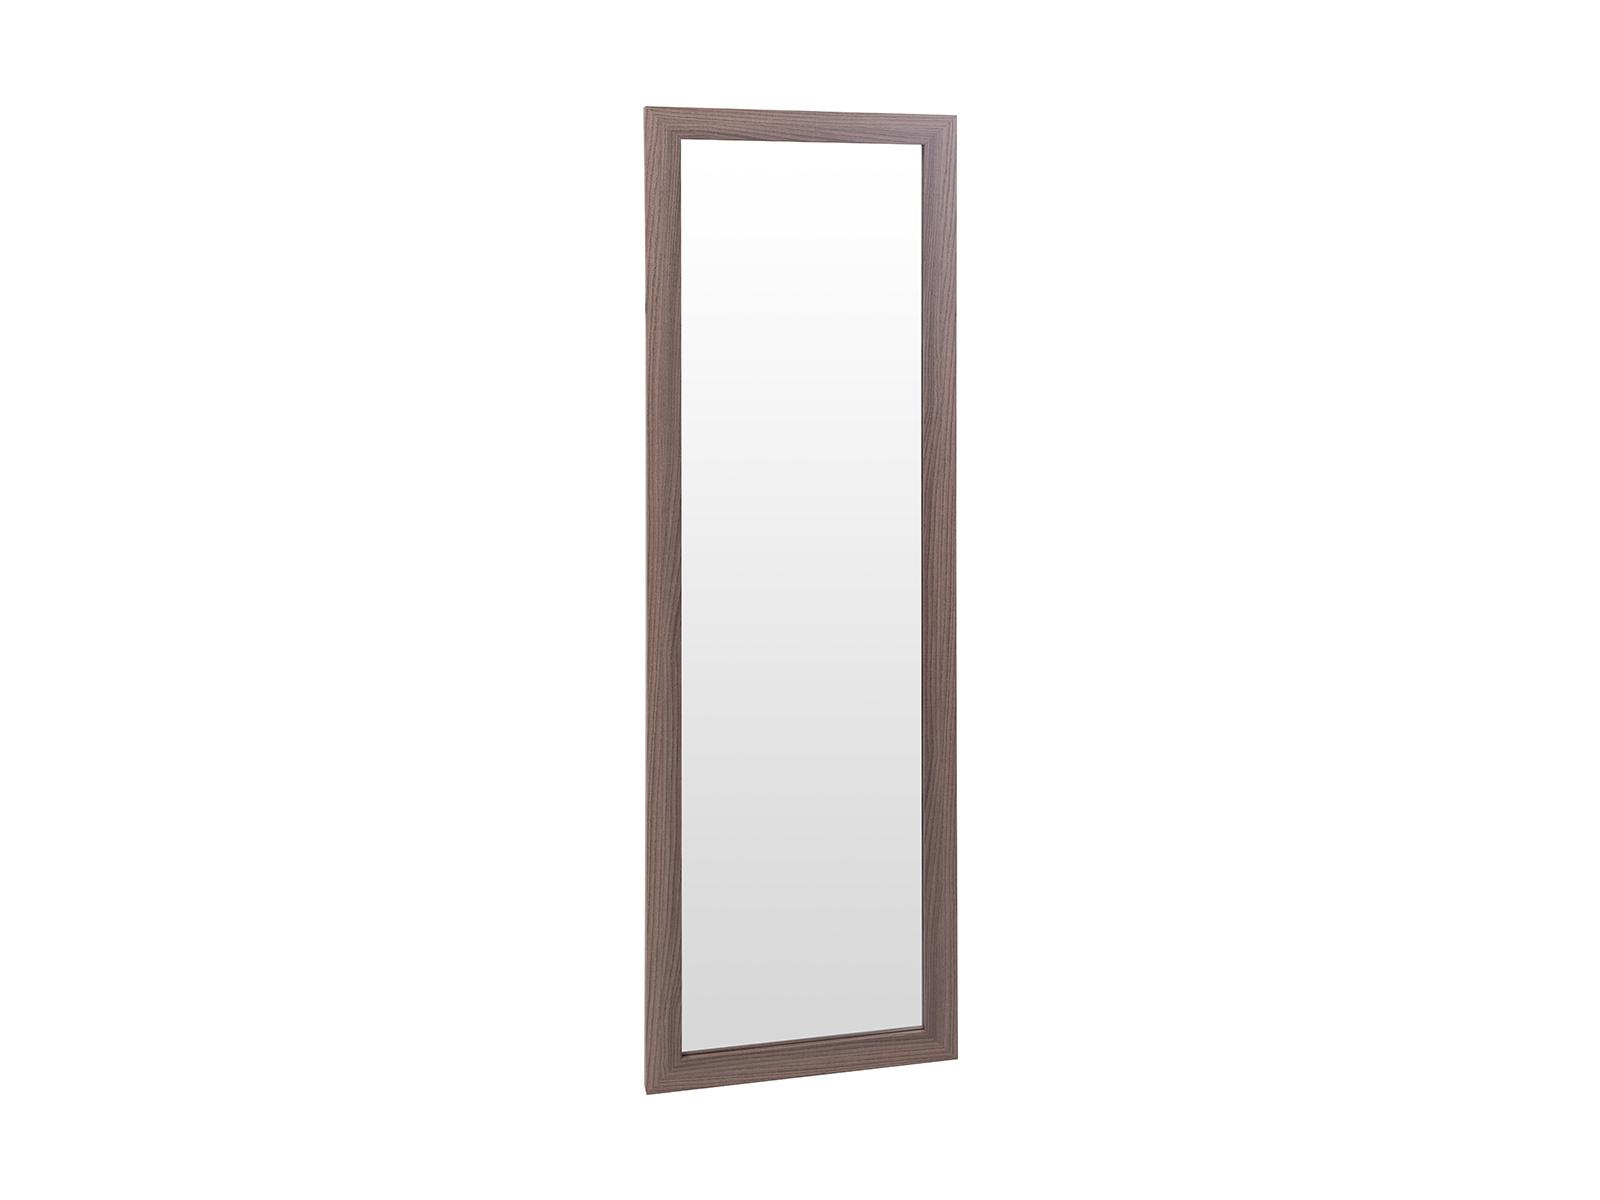 Зеркало LarsenЗеркала<br>Зеркало декоративное<br>